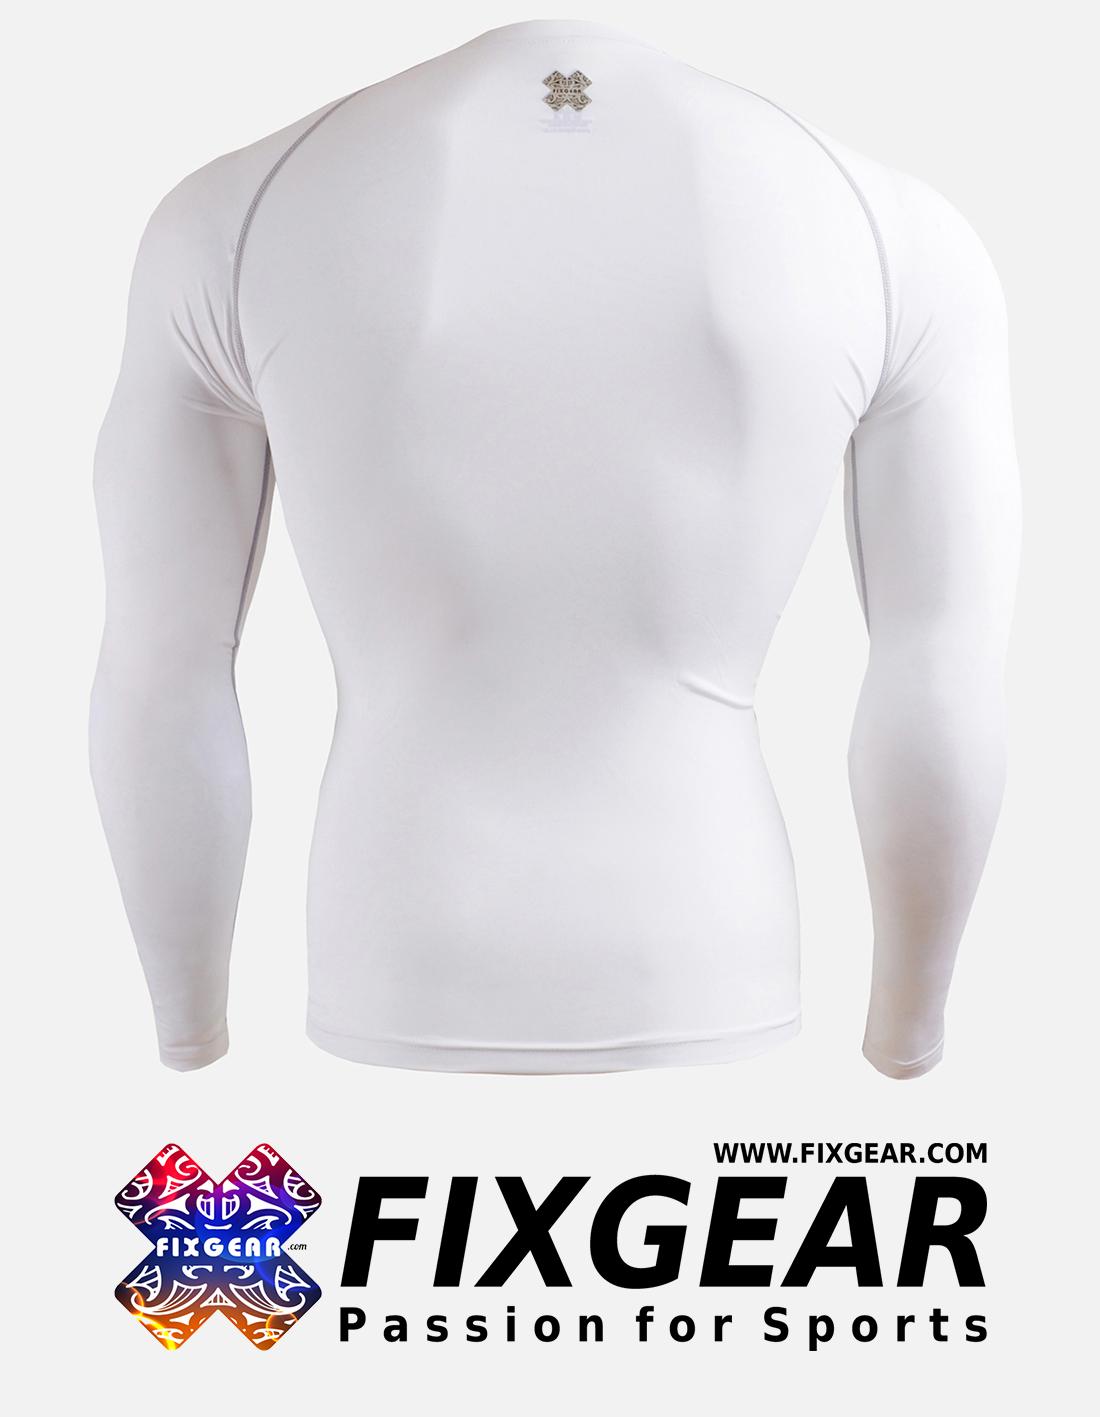 FIXGEAR CPL-WS Skin-tight Compression Base Layer Shirt